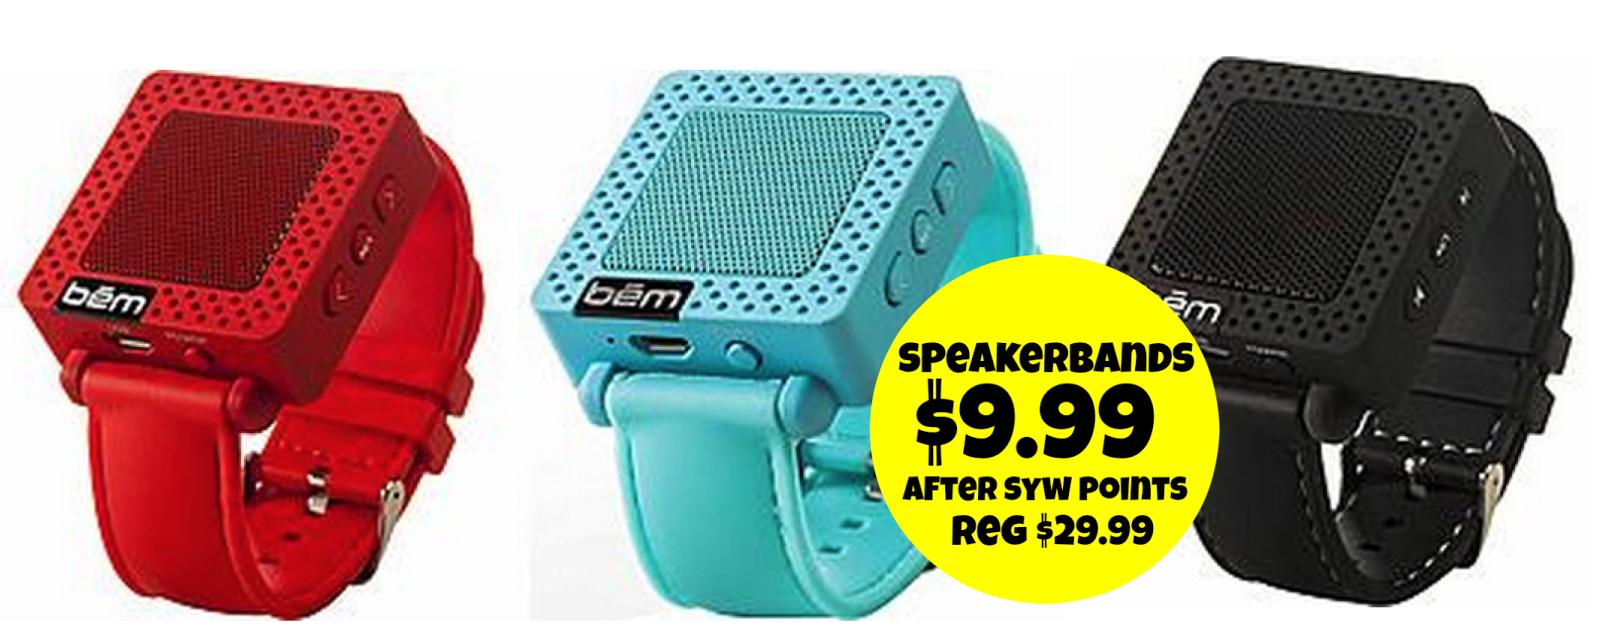 http://www.thebinderladies.com/2014/11/kmart-bem-speakerband-bluetooth.html